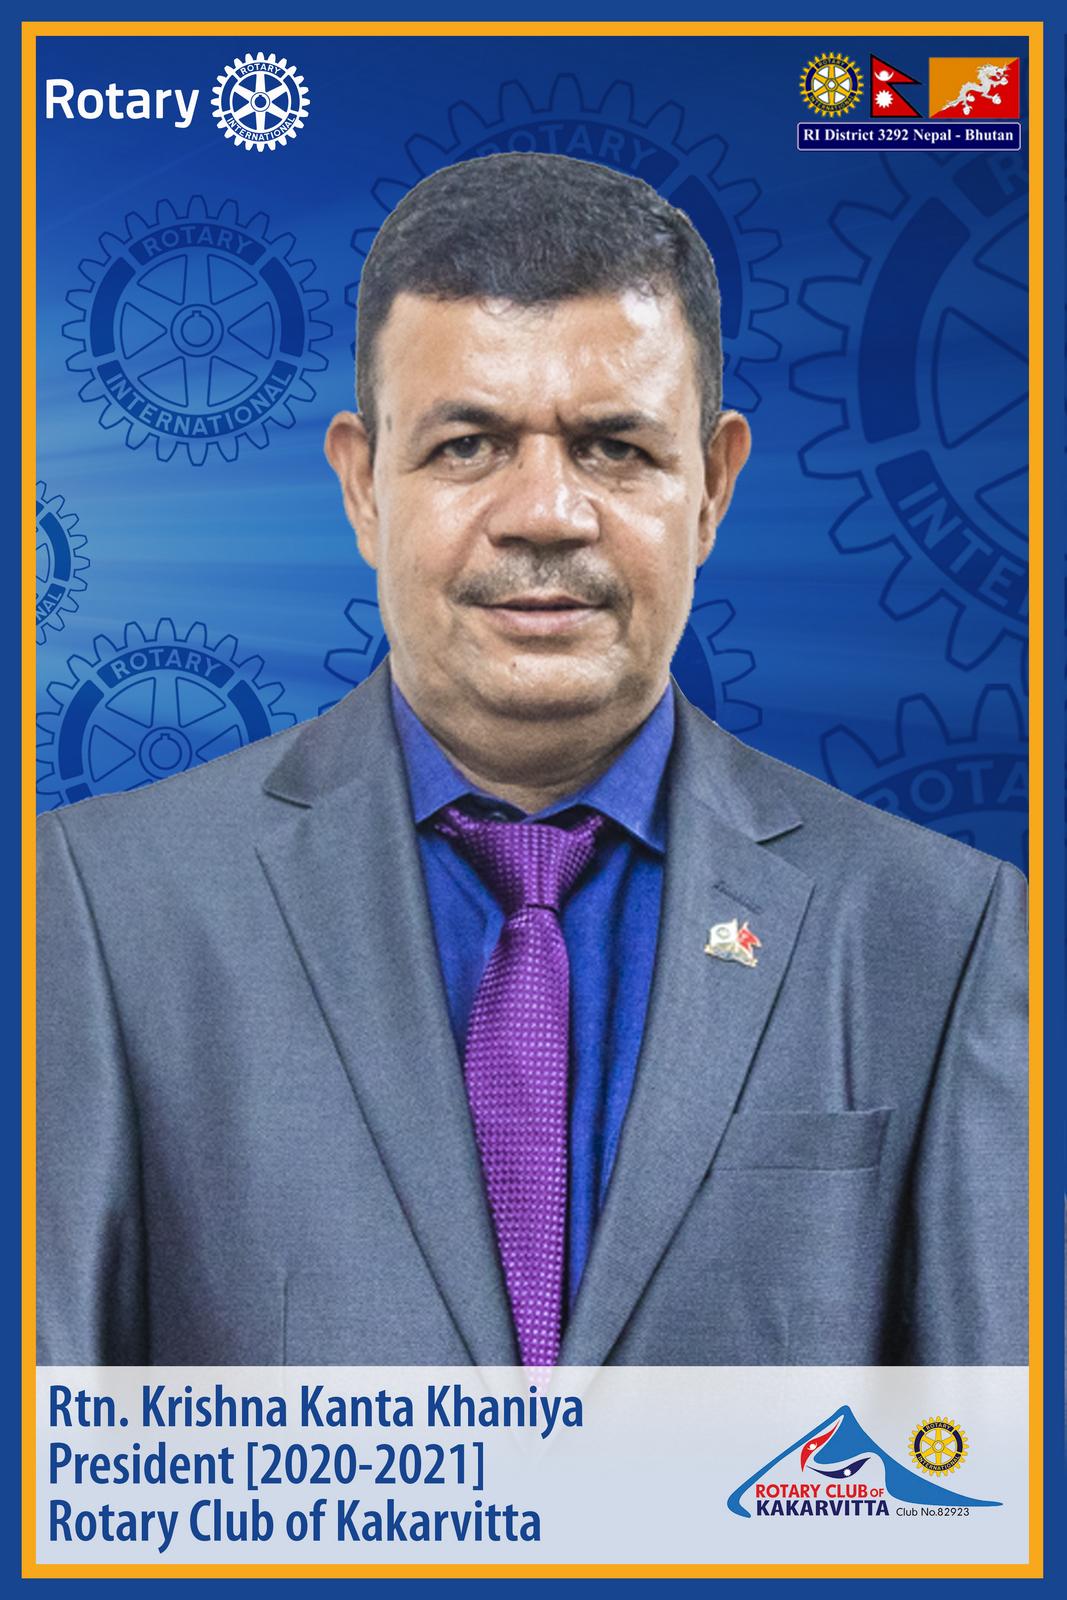 rtn. krishna kanta khaniya president 2020 21 rotary club of kakarvitta